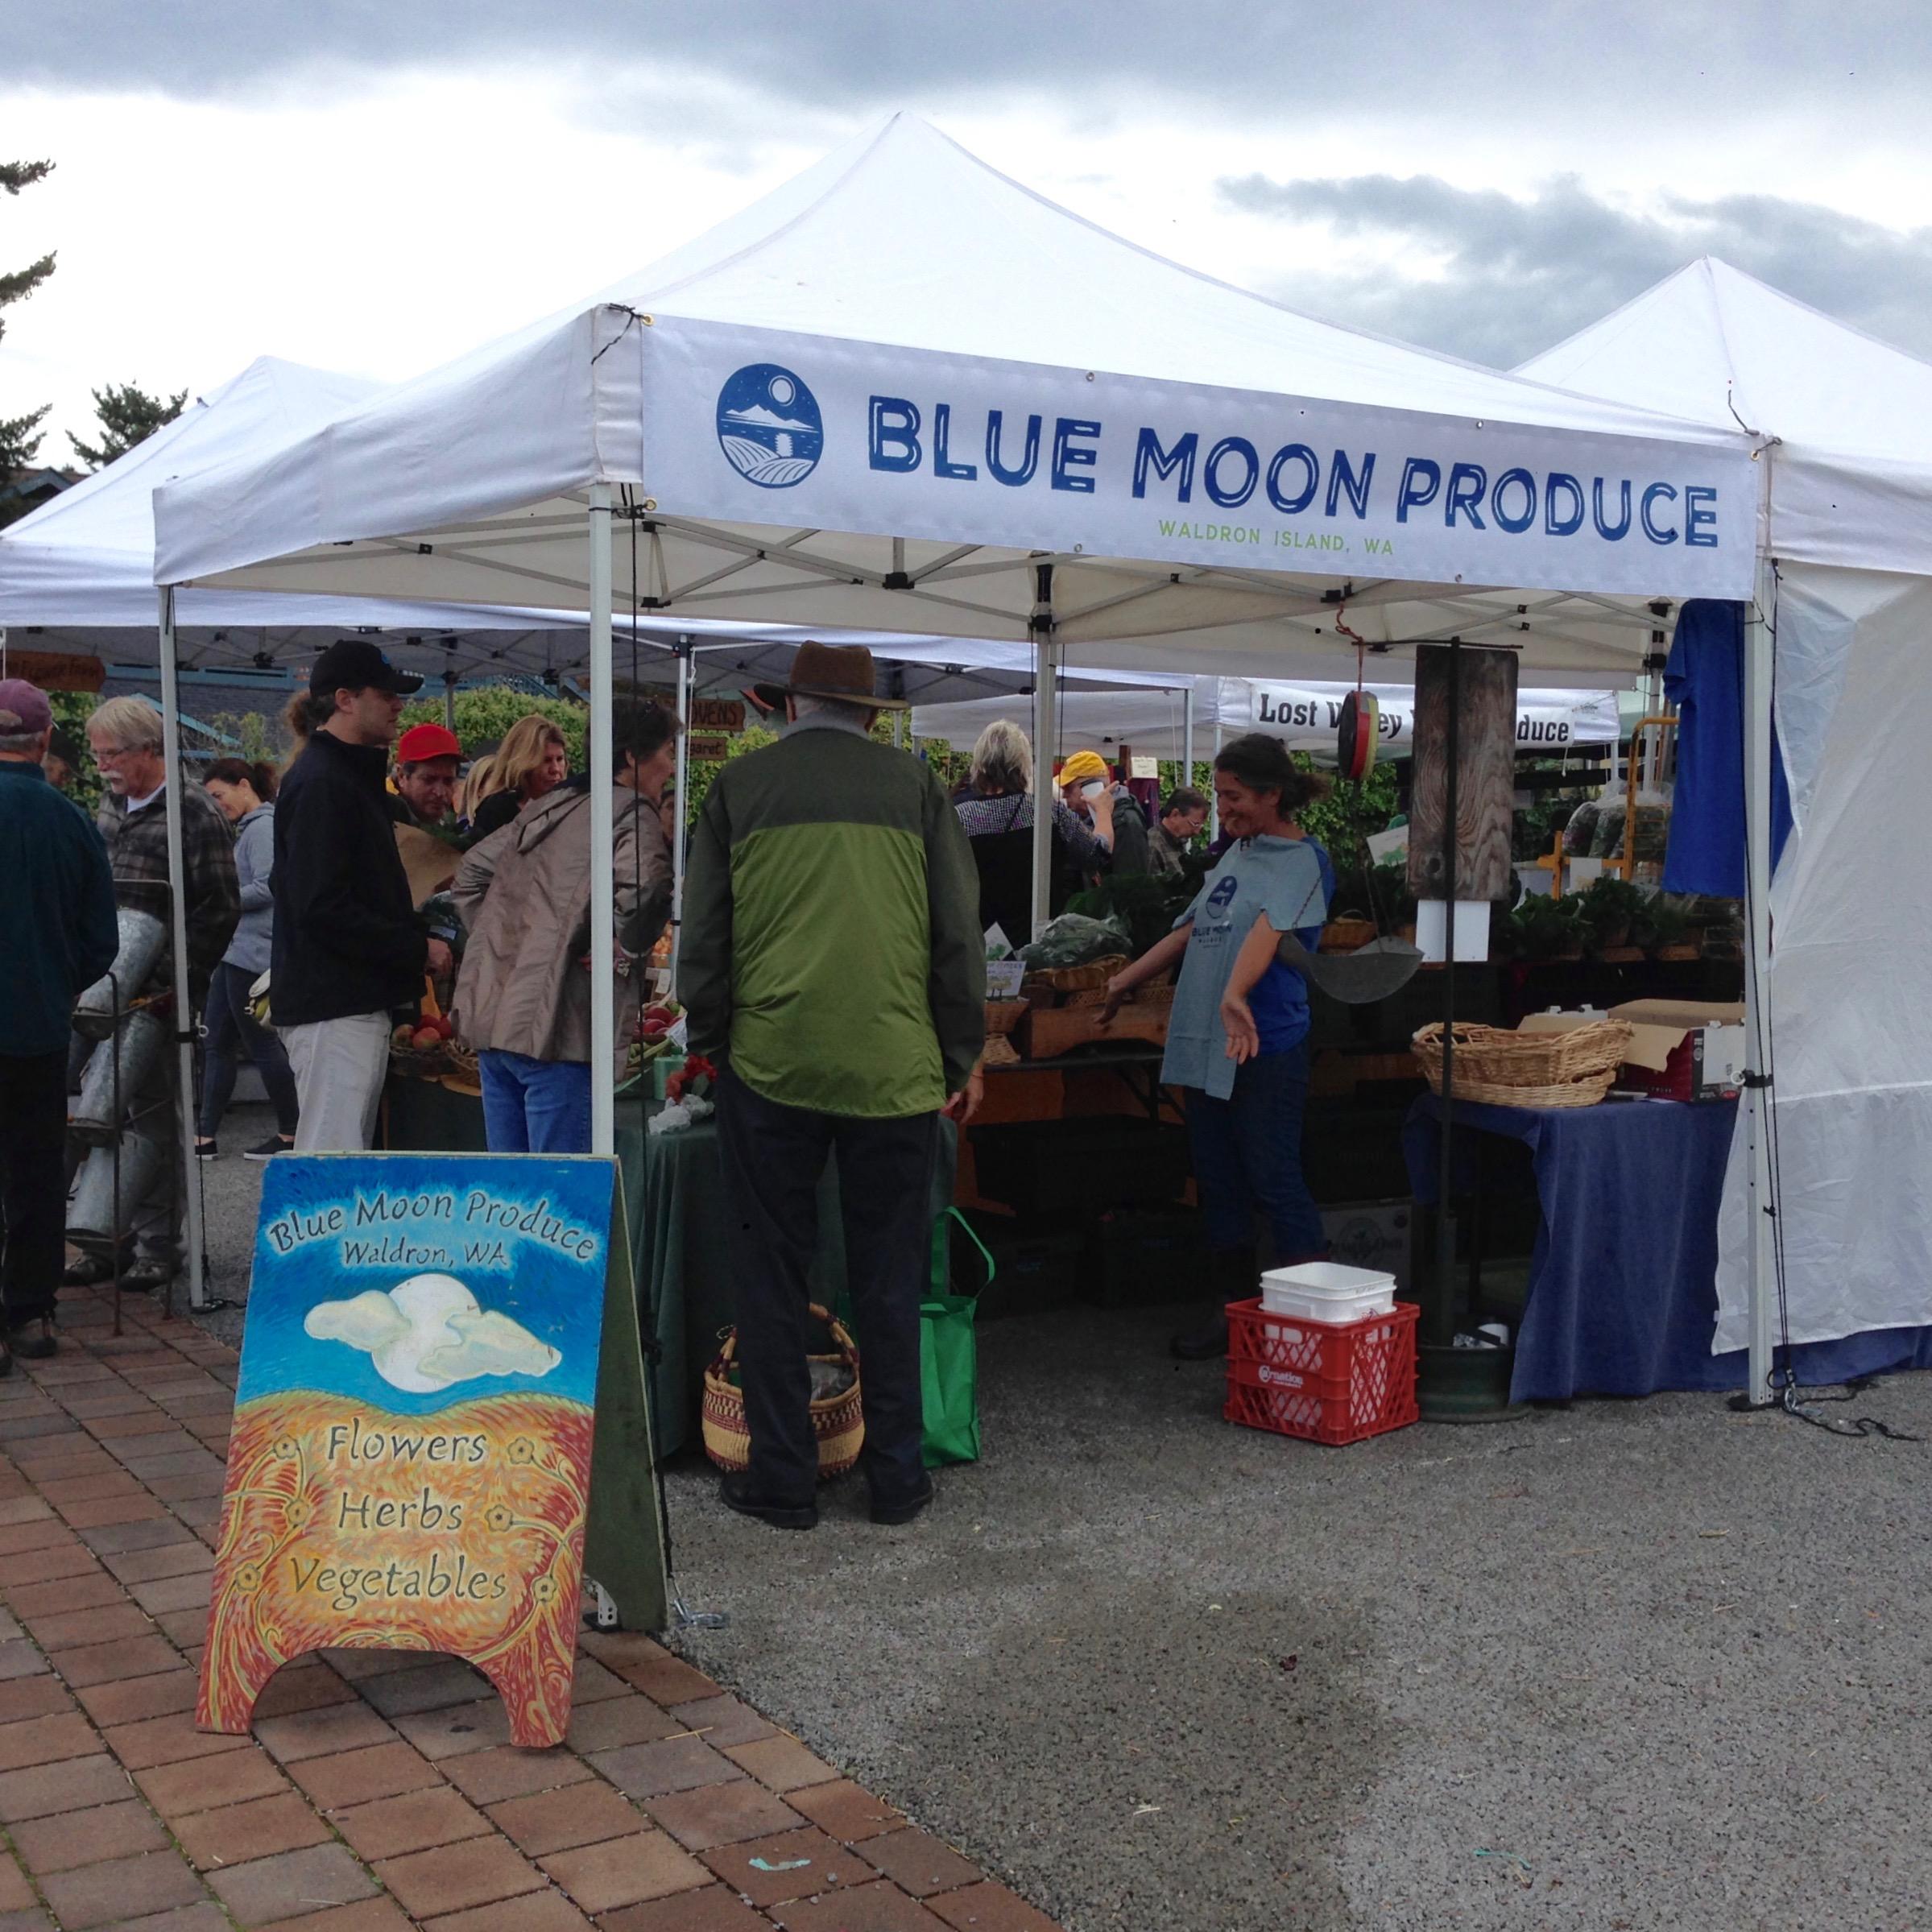 BLUE MOON PRODUCE (banner)